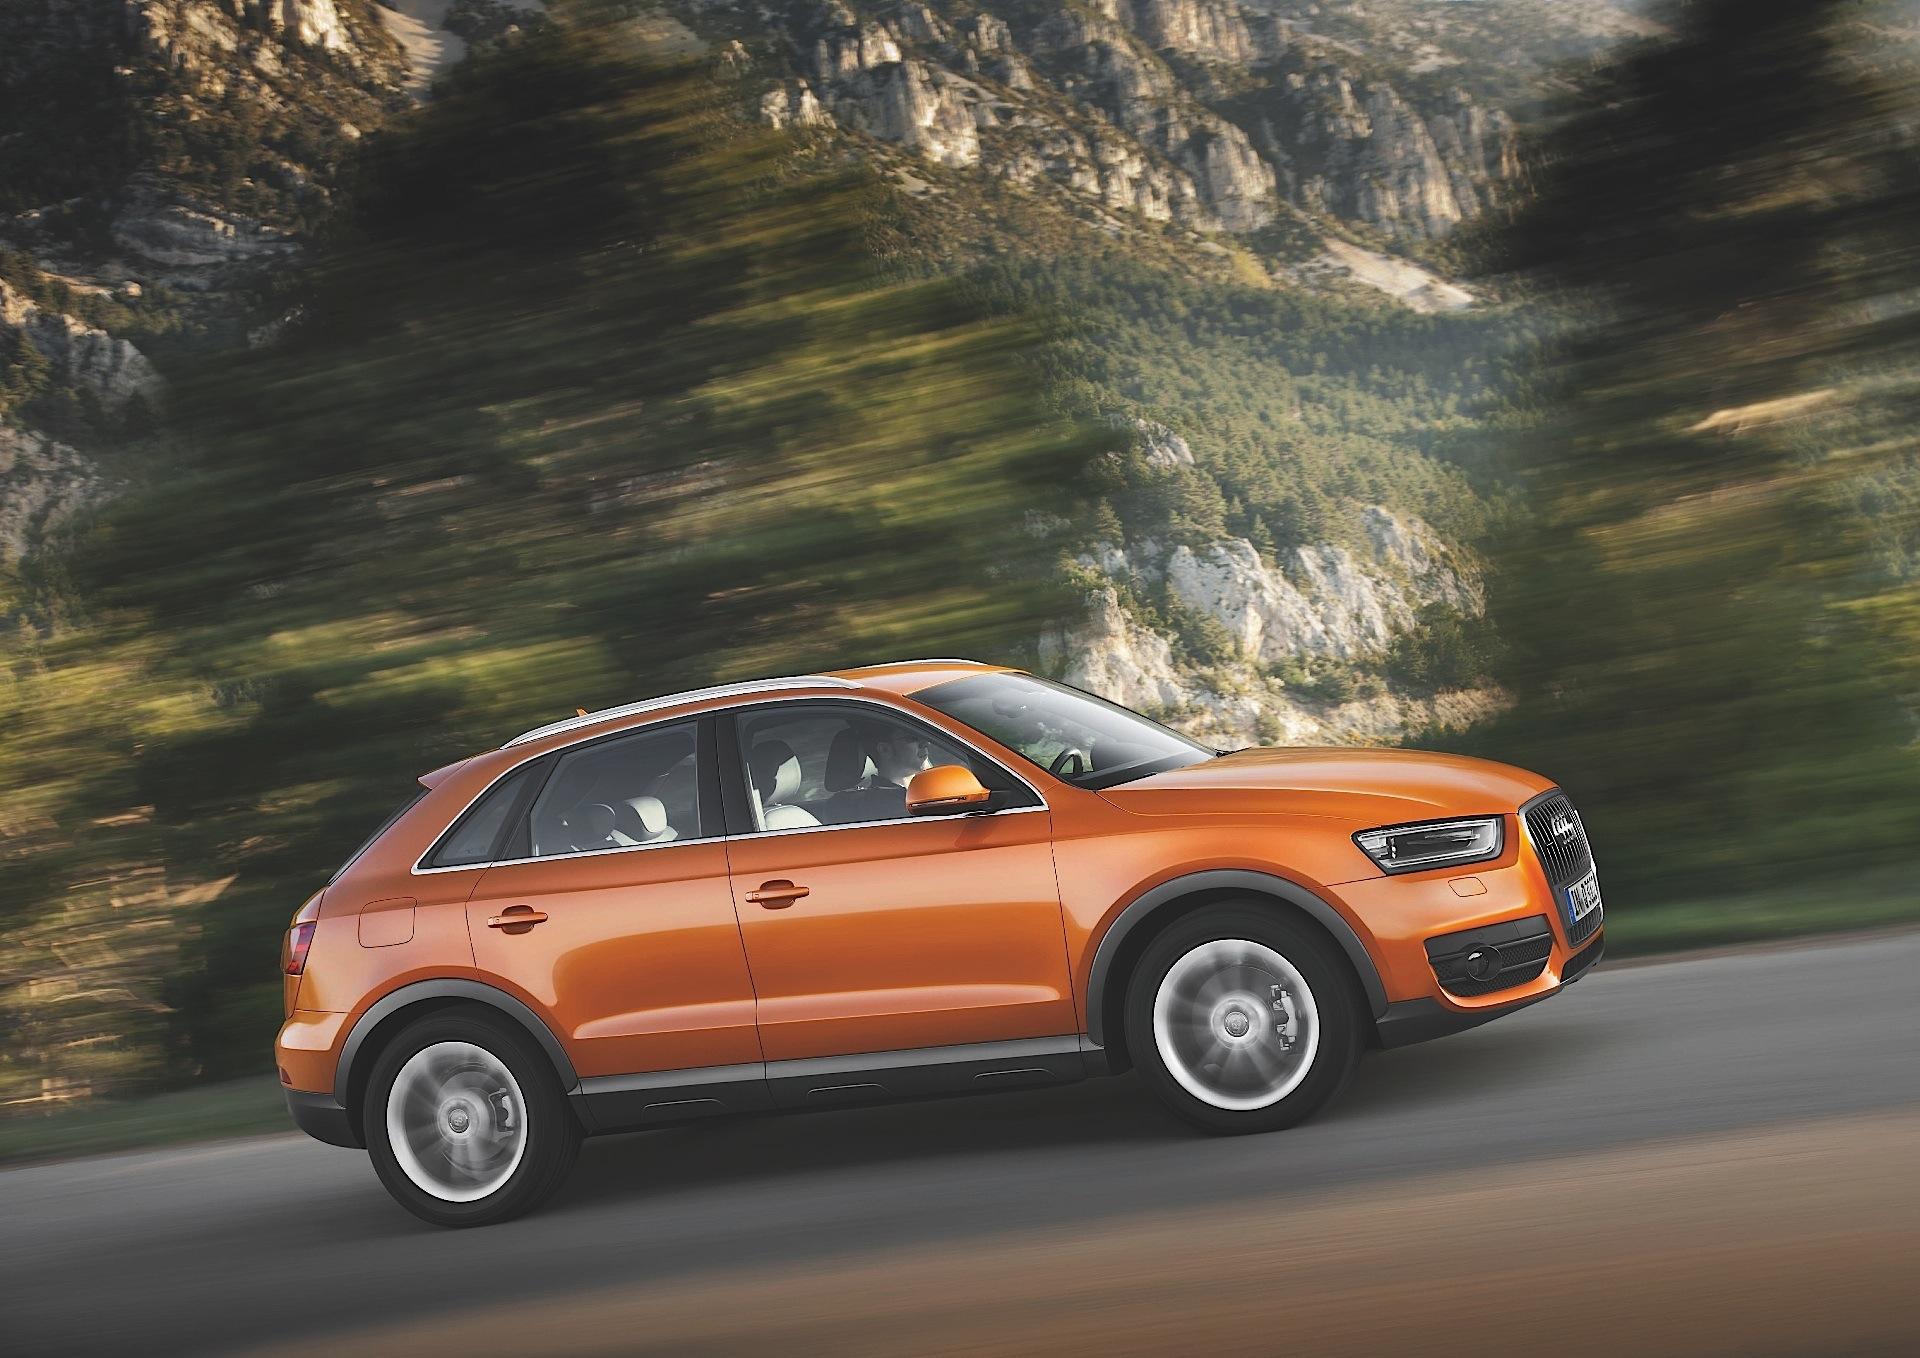 Kelebihan Audi Q3 2011 Tangguh